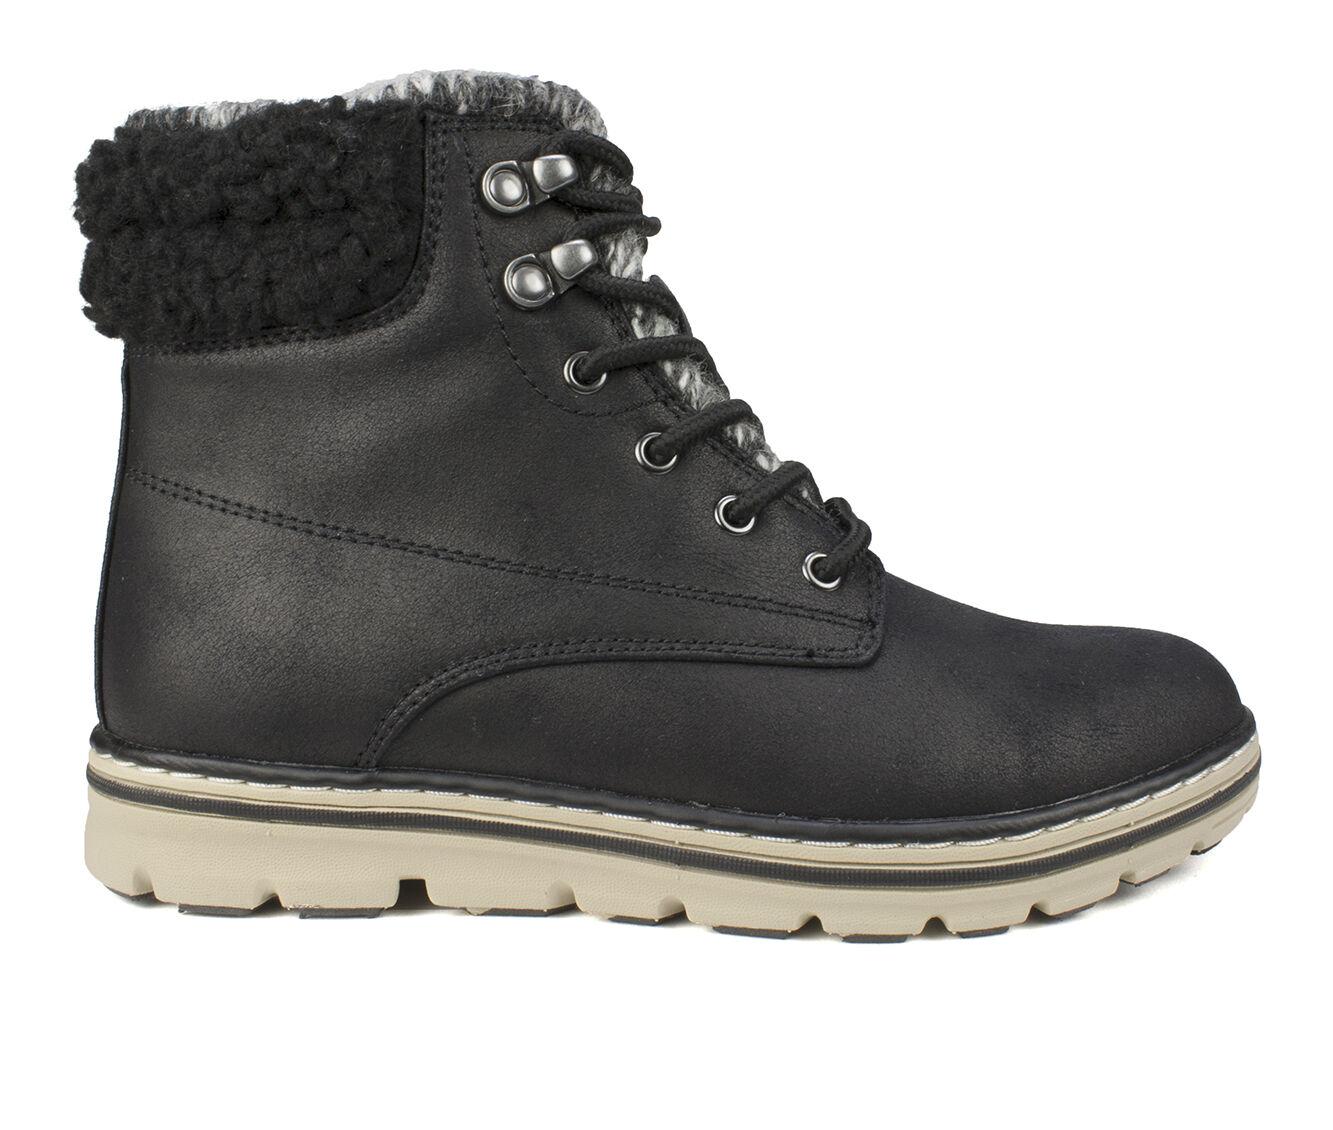 Women's Cliffs Karis Hiking Boots Black